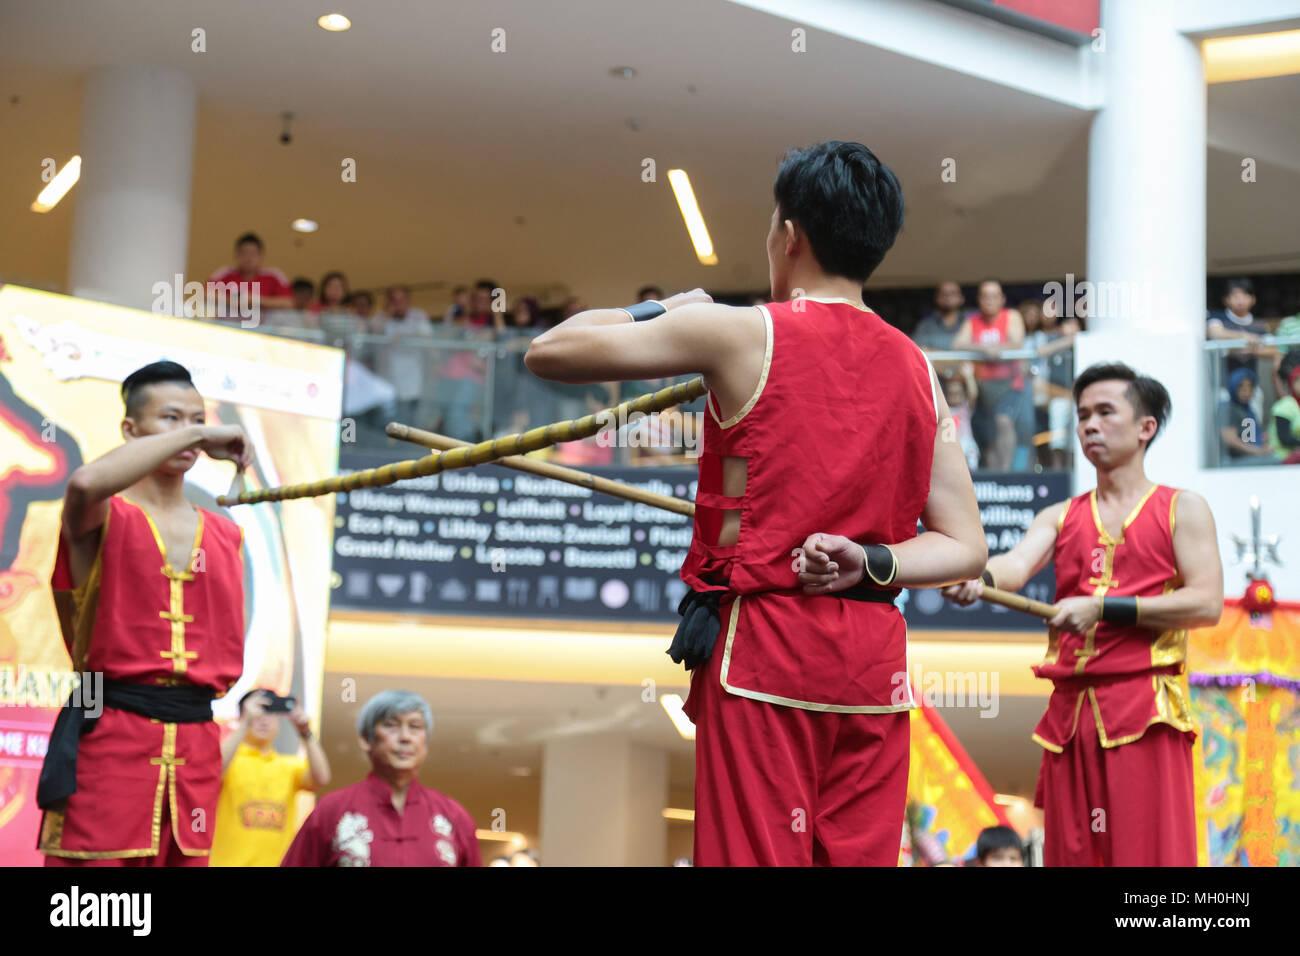 Chinese traditional stuntman performing his stunts at VIVA HOME shopping mall in Kuala Lumpur, Malaysia. - Stock Image